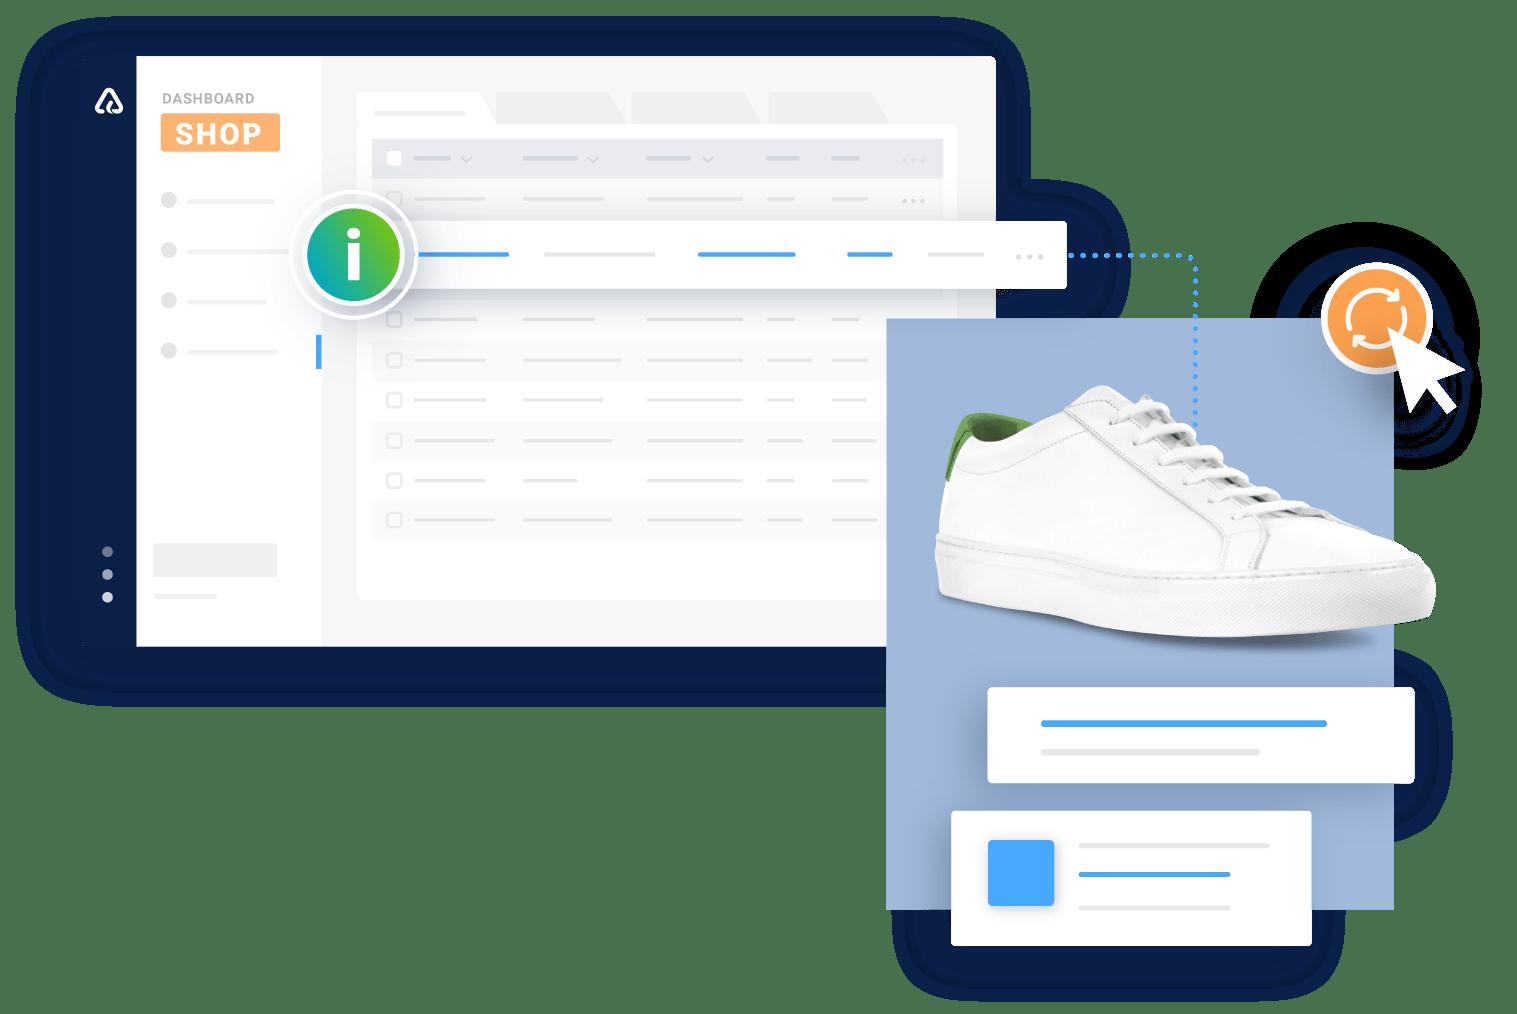 Aktueller Product Content für den eCommerce mit authorized.by®